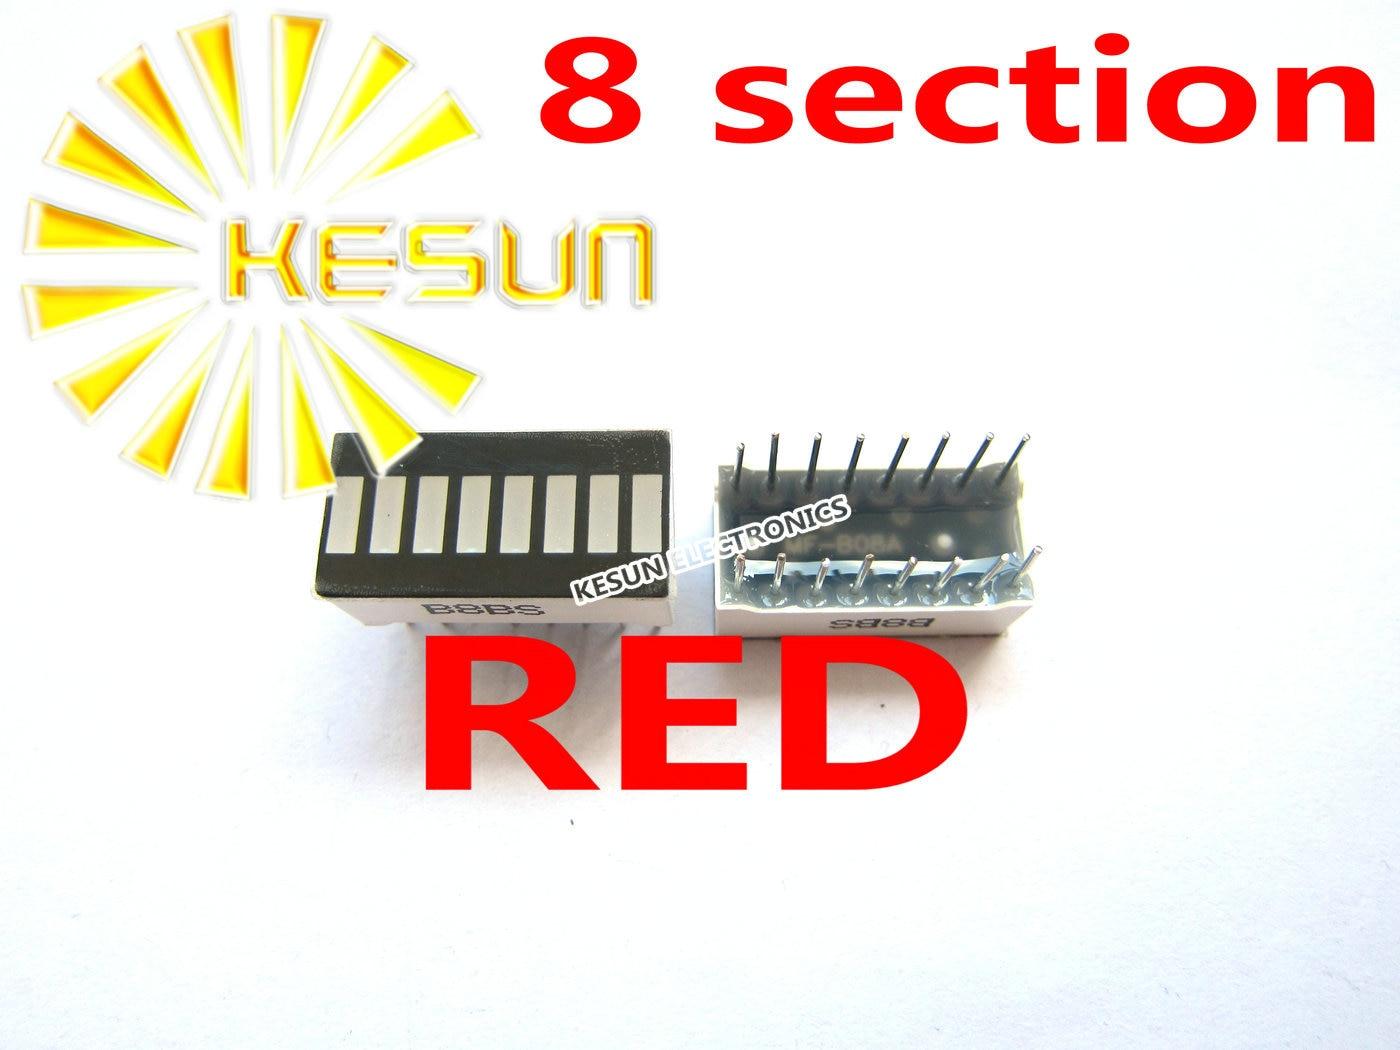 100PCS X 8 Segment Red Digital Tube LED Display Module B8R B8BR B08BR